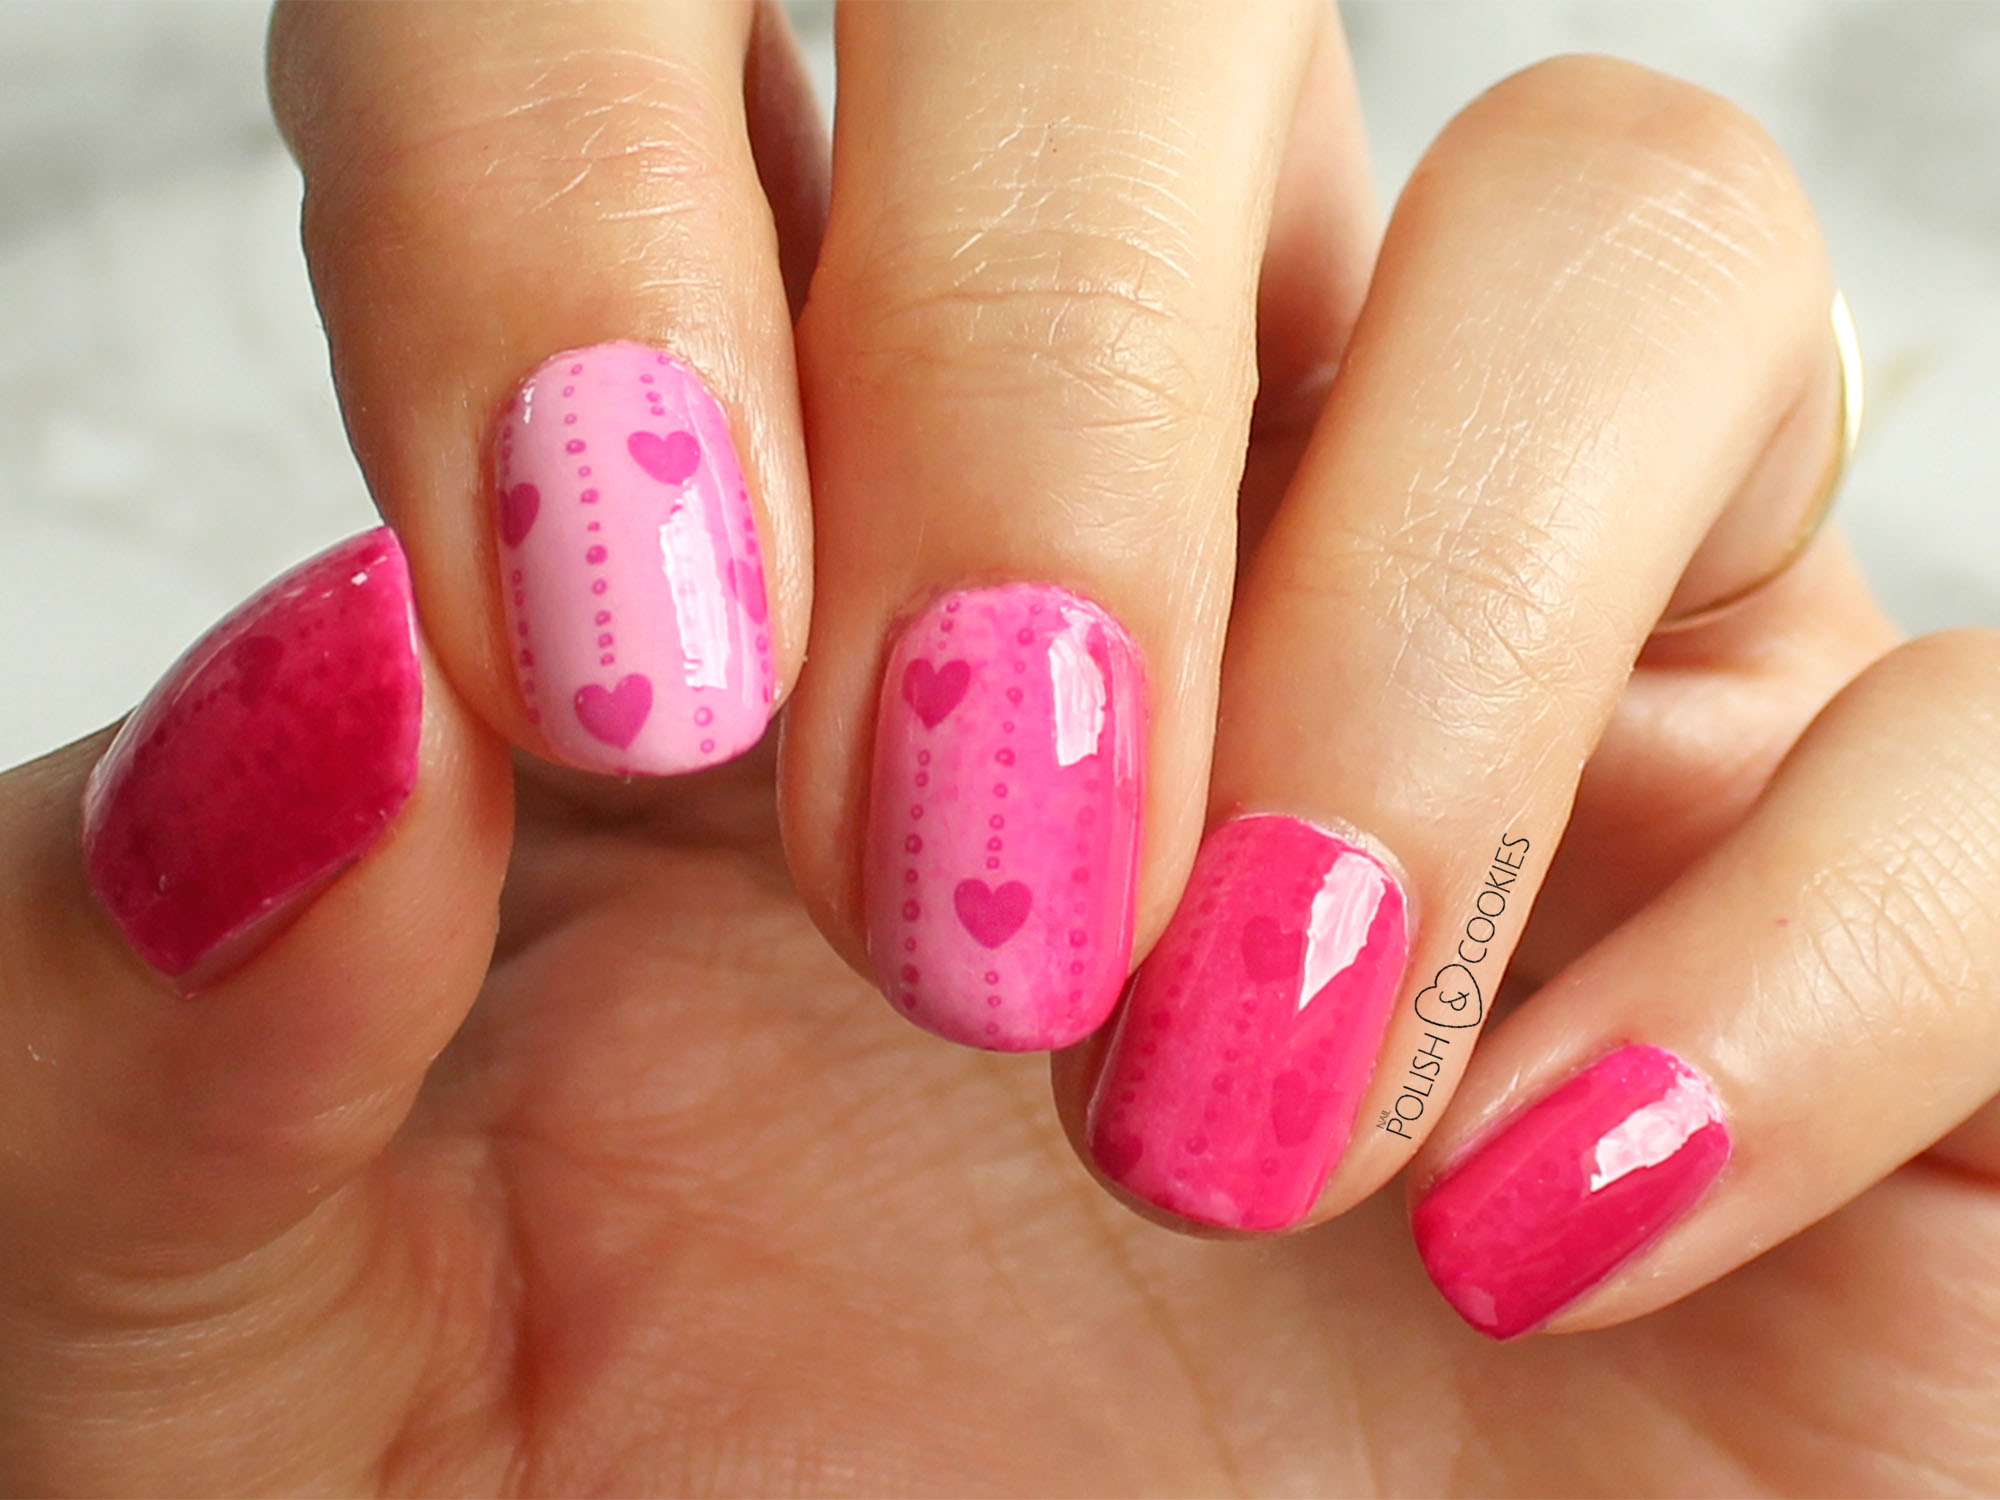 paznokcie stemple różowe